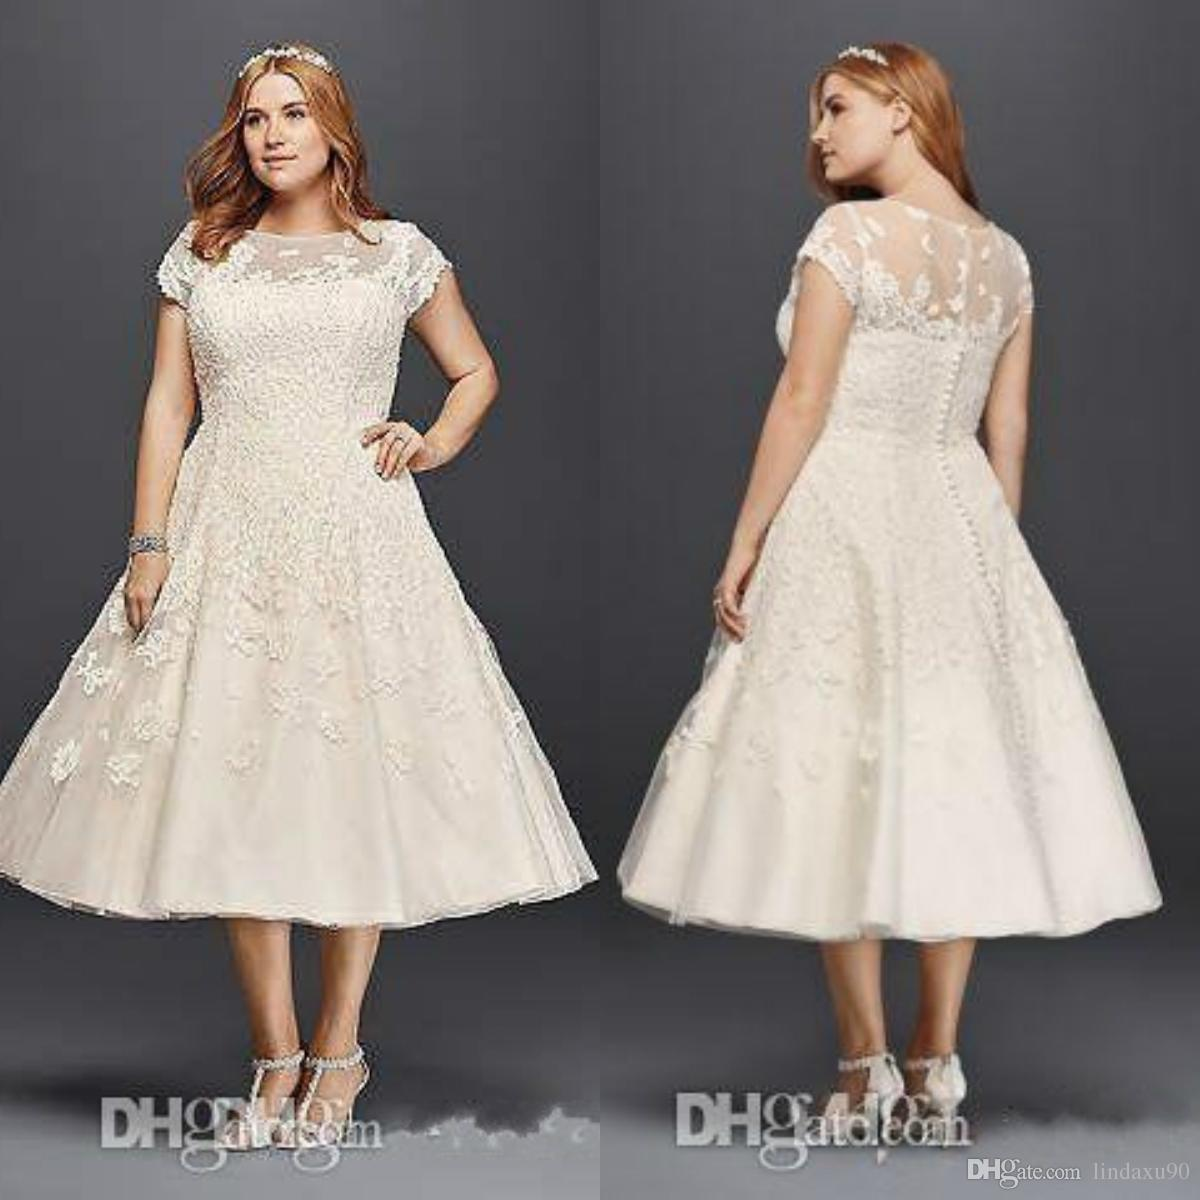 Discount Vintage Tea Length Wedding Dresses Plus Size A Line 2019 Garden  Outdoor Oleg Cassini Short Sleeve Holiday Beach Sheer Back Bridal Gowns A  ...